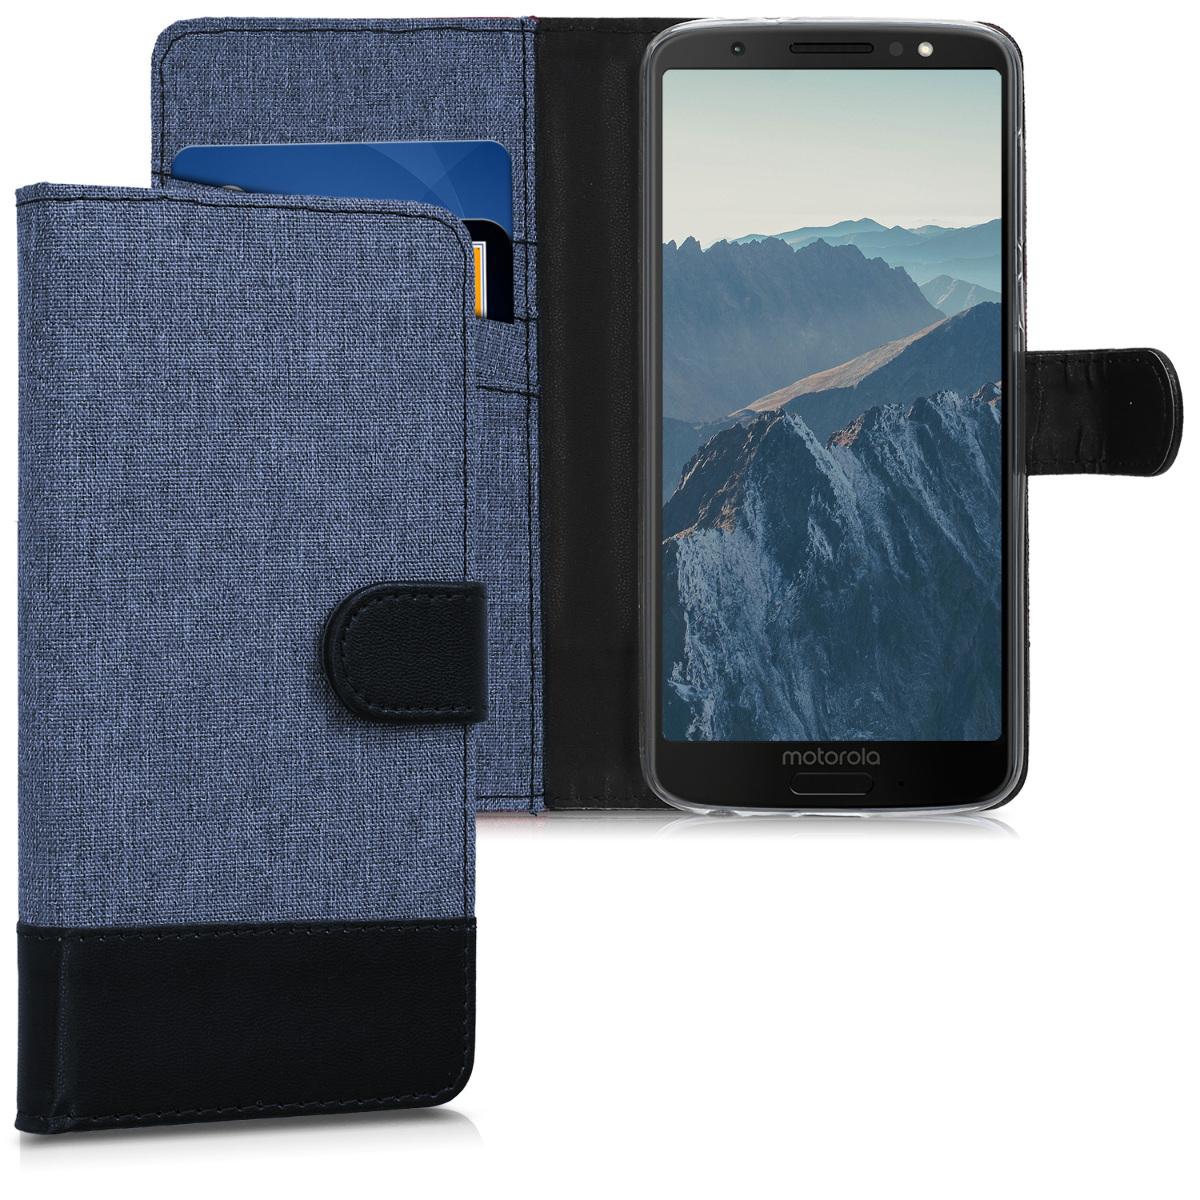 KW Θήκη Πορτοφόλι Motorola Moto G6 - Dark Blue / Black Canvas (44603.05)